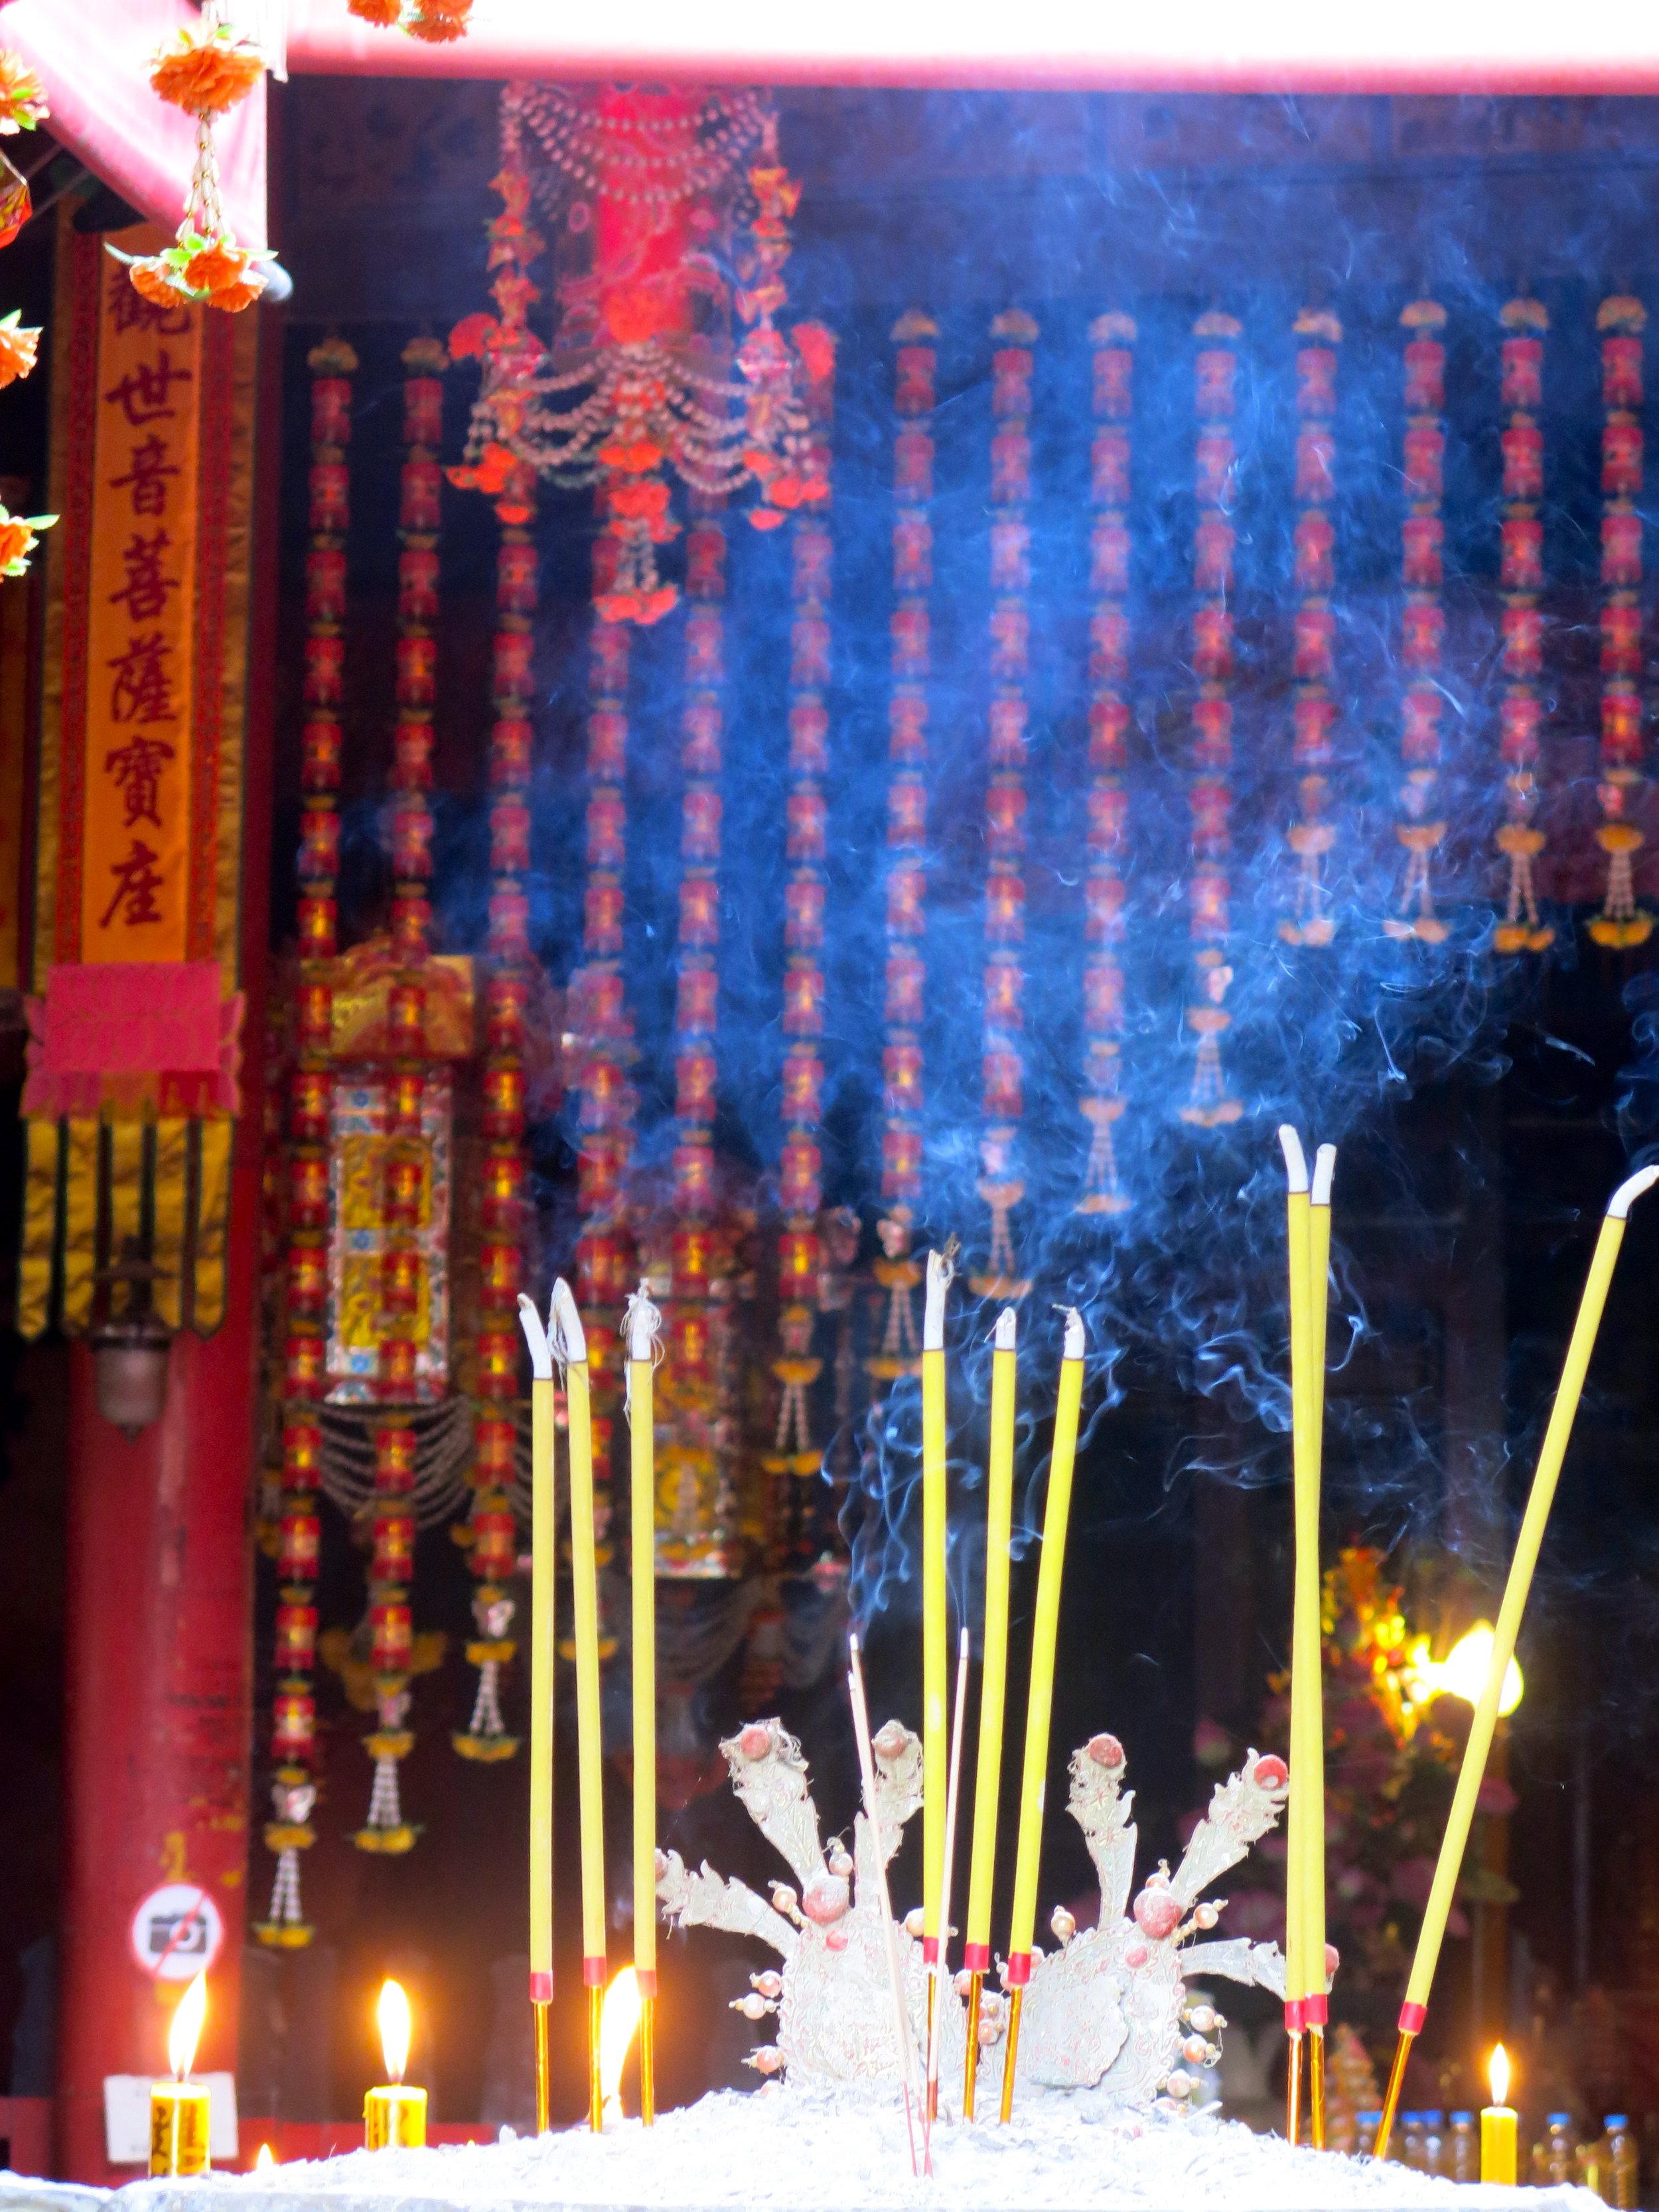 Burning incense sticks